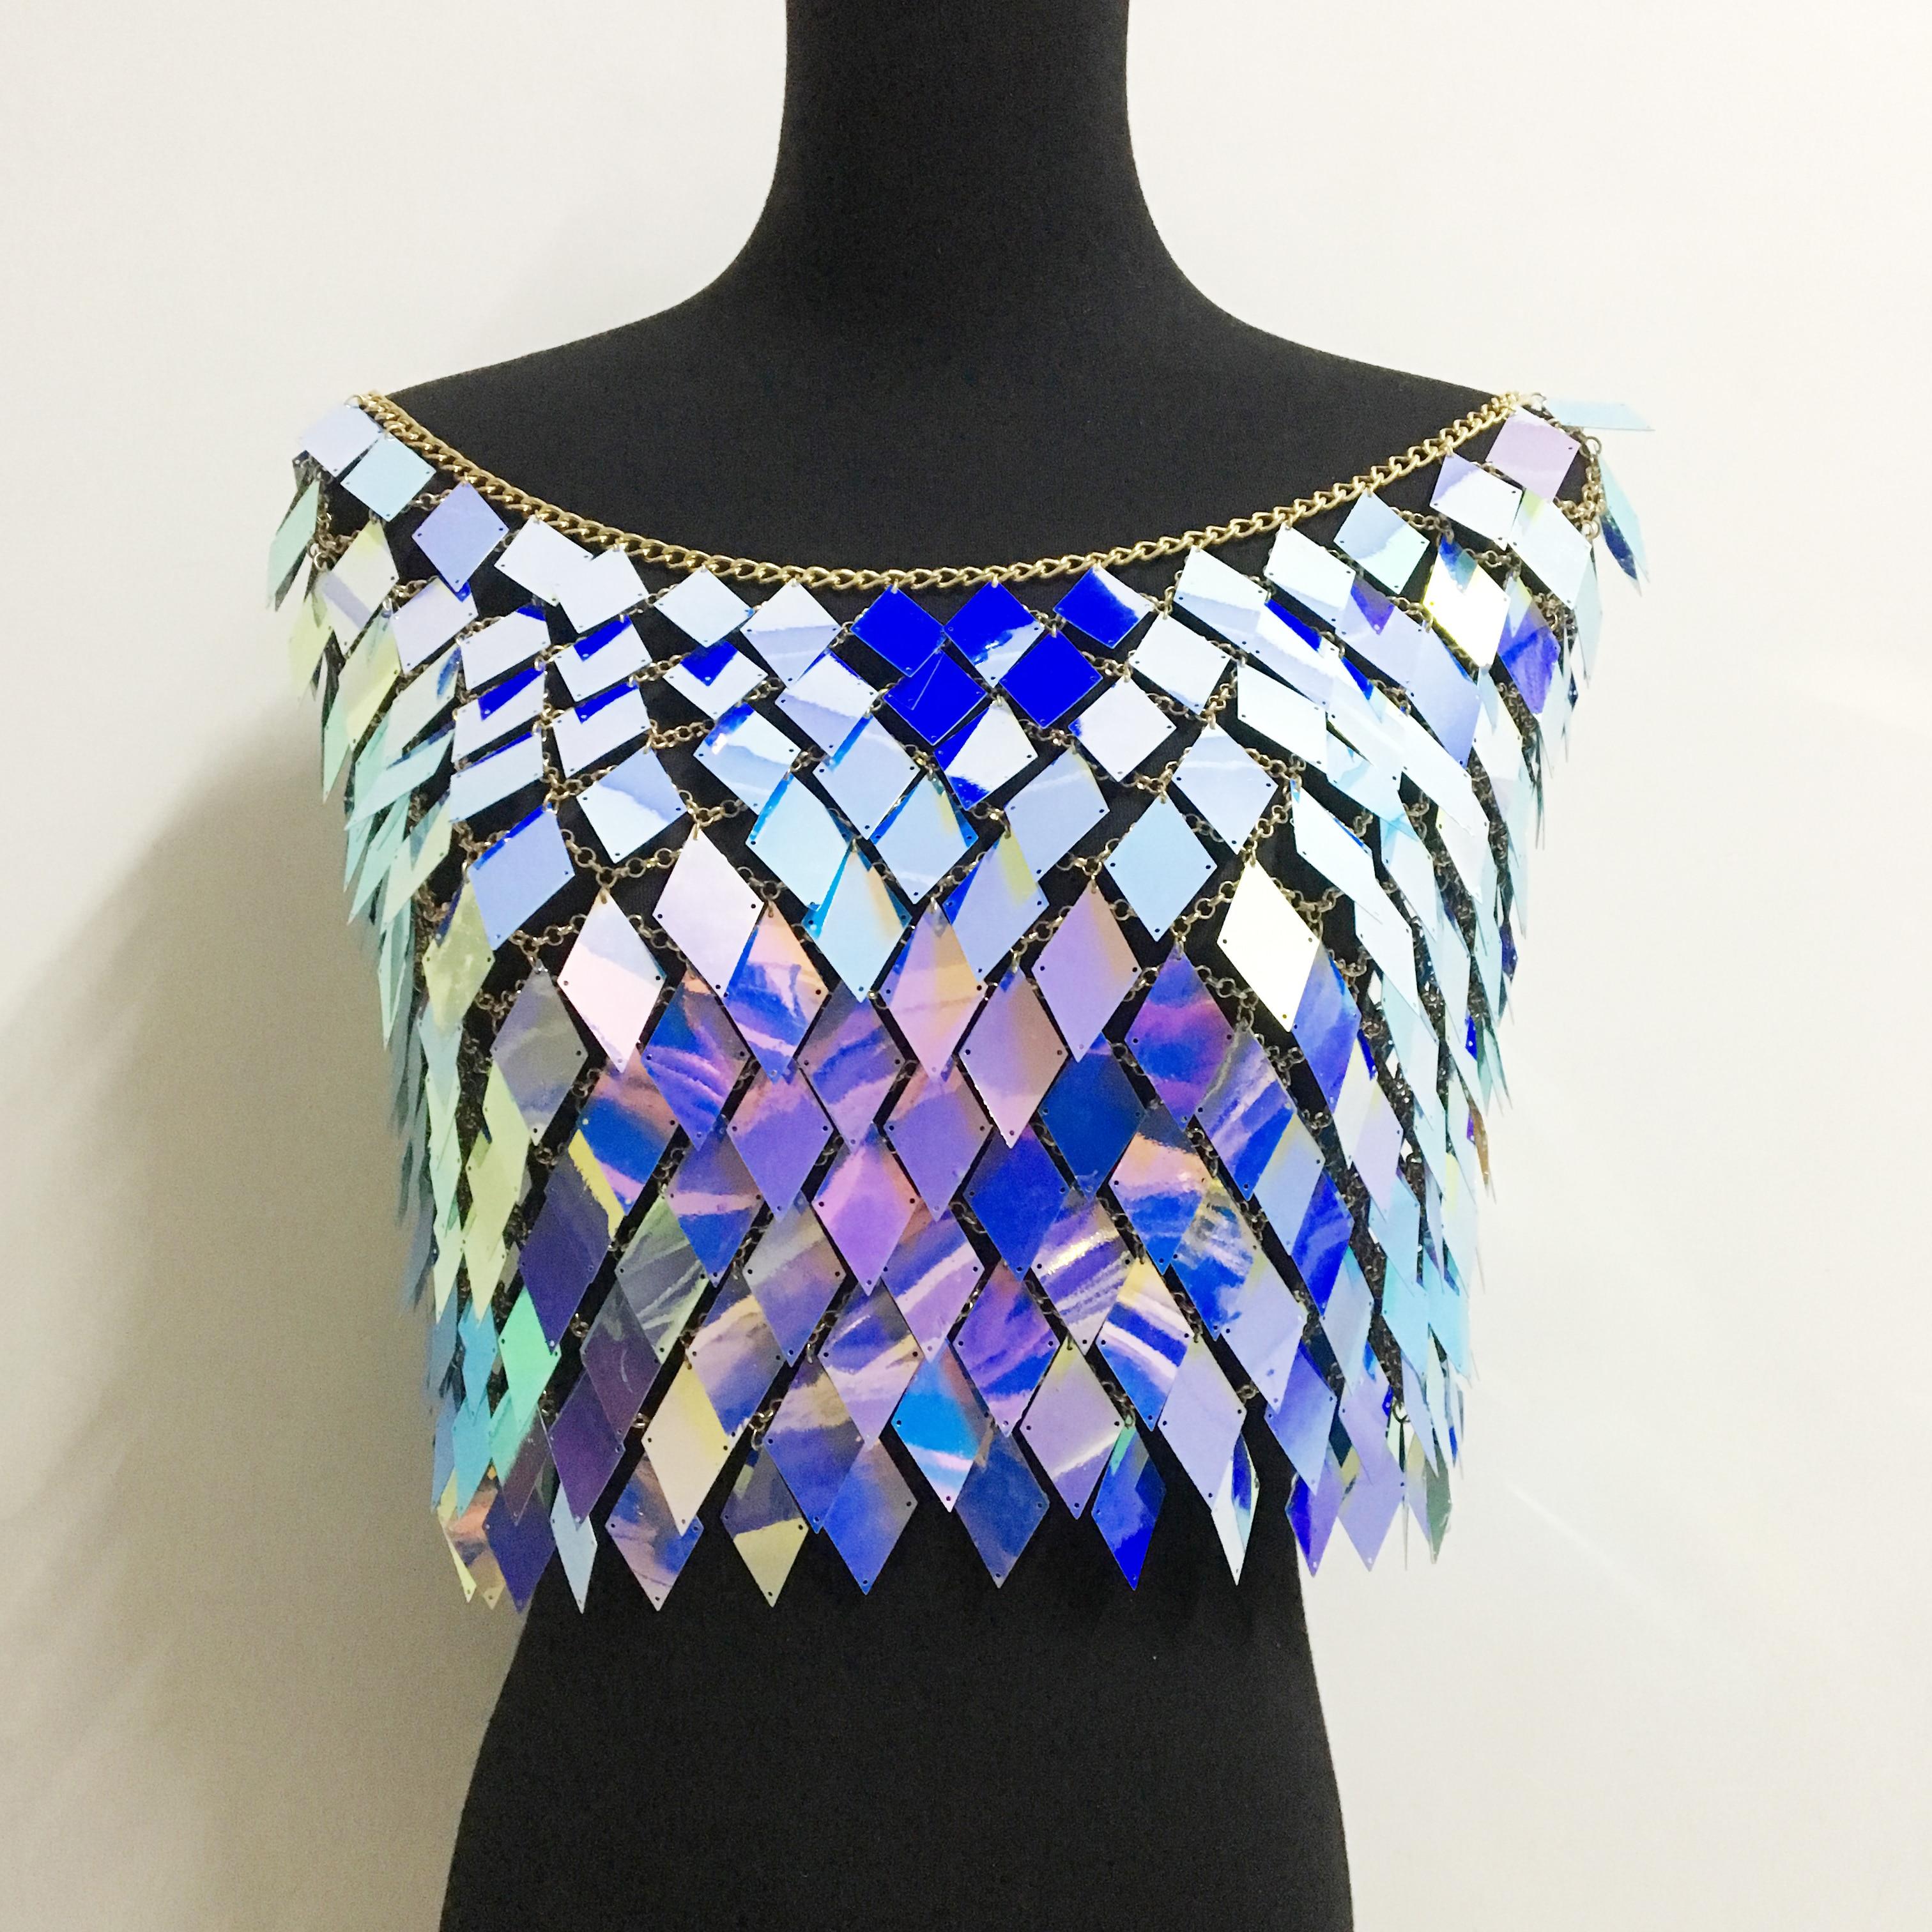 Electric Blue Fishnet Crop Top Bra Diamante Sequin Glitter Festival Rave Ibiza